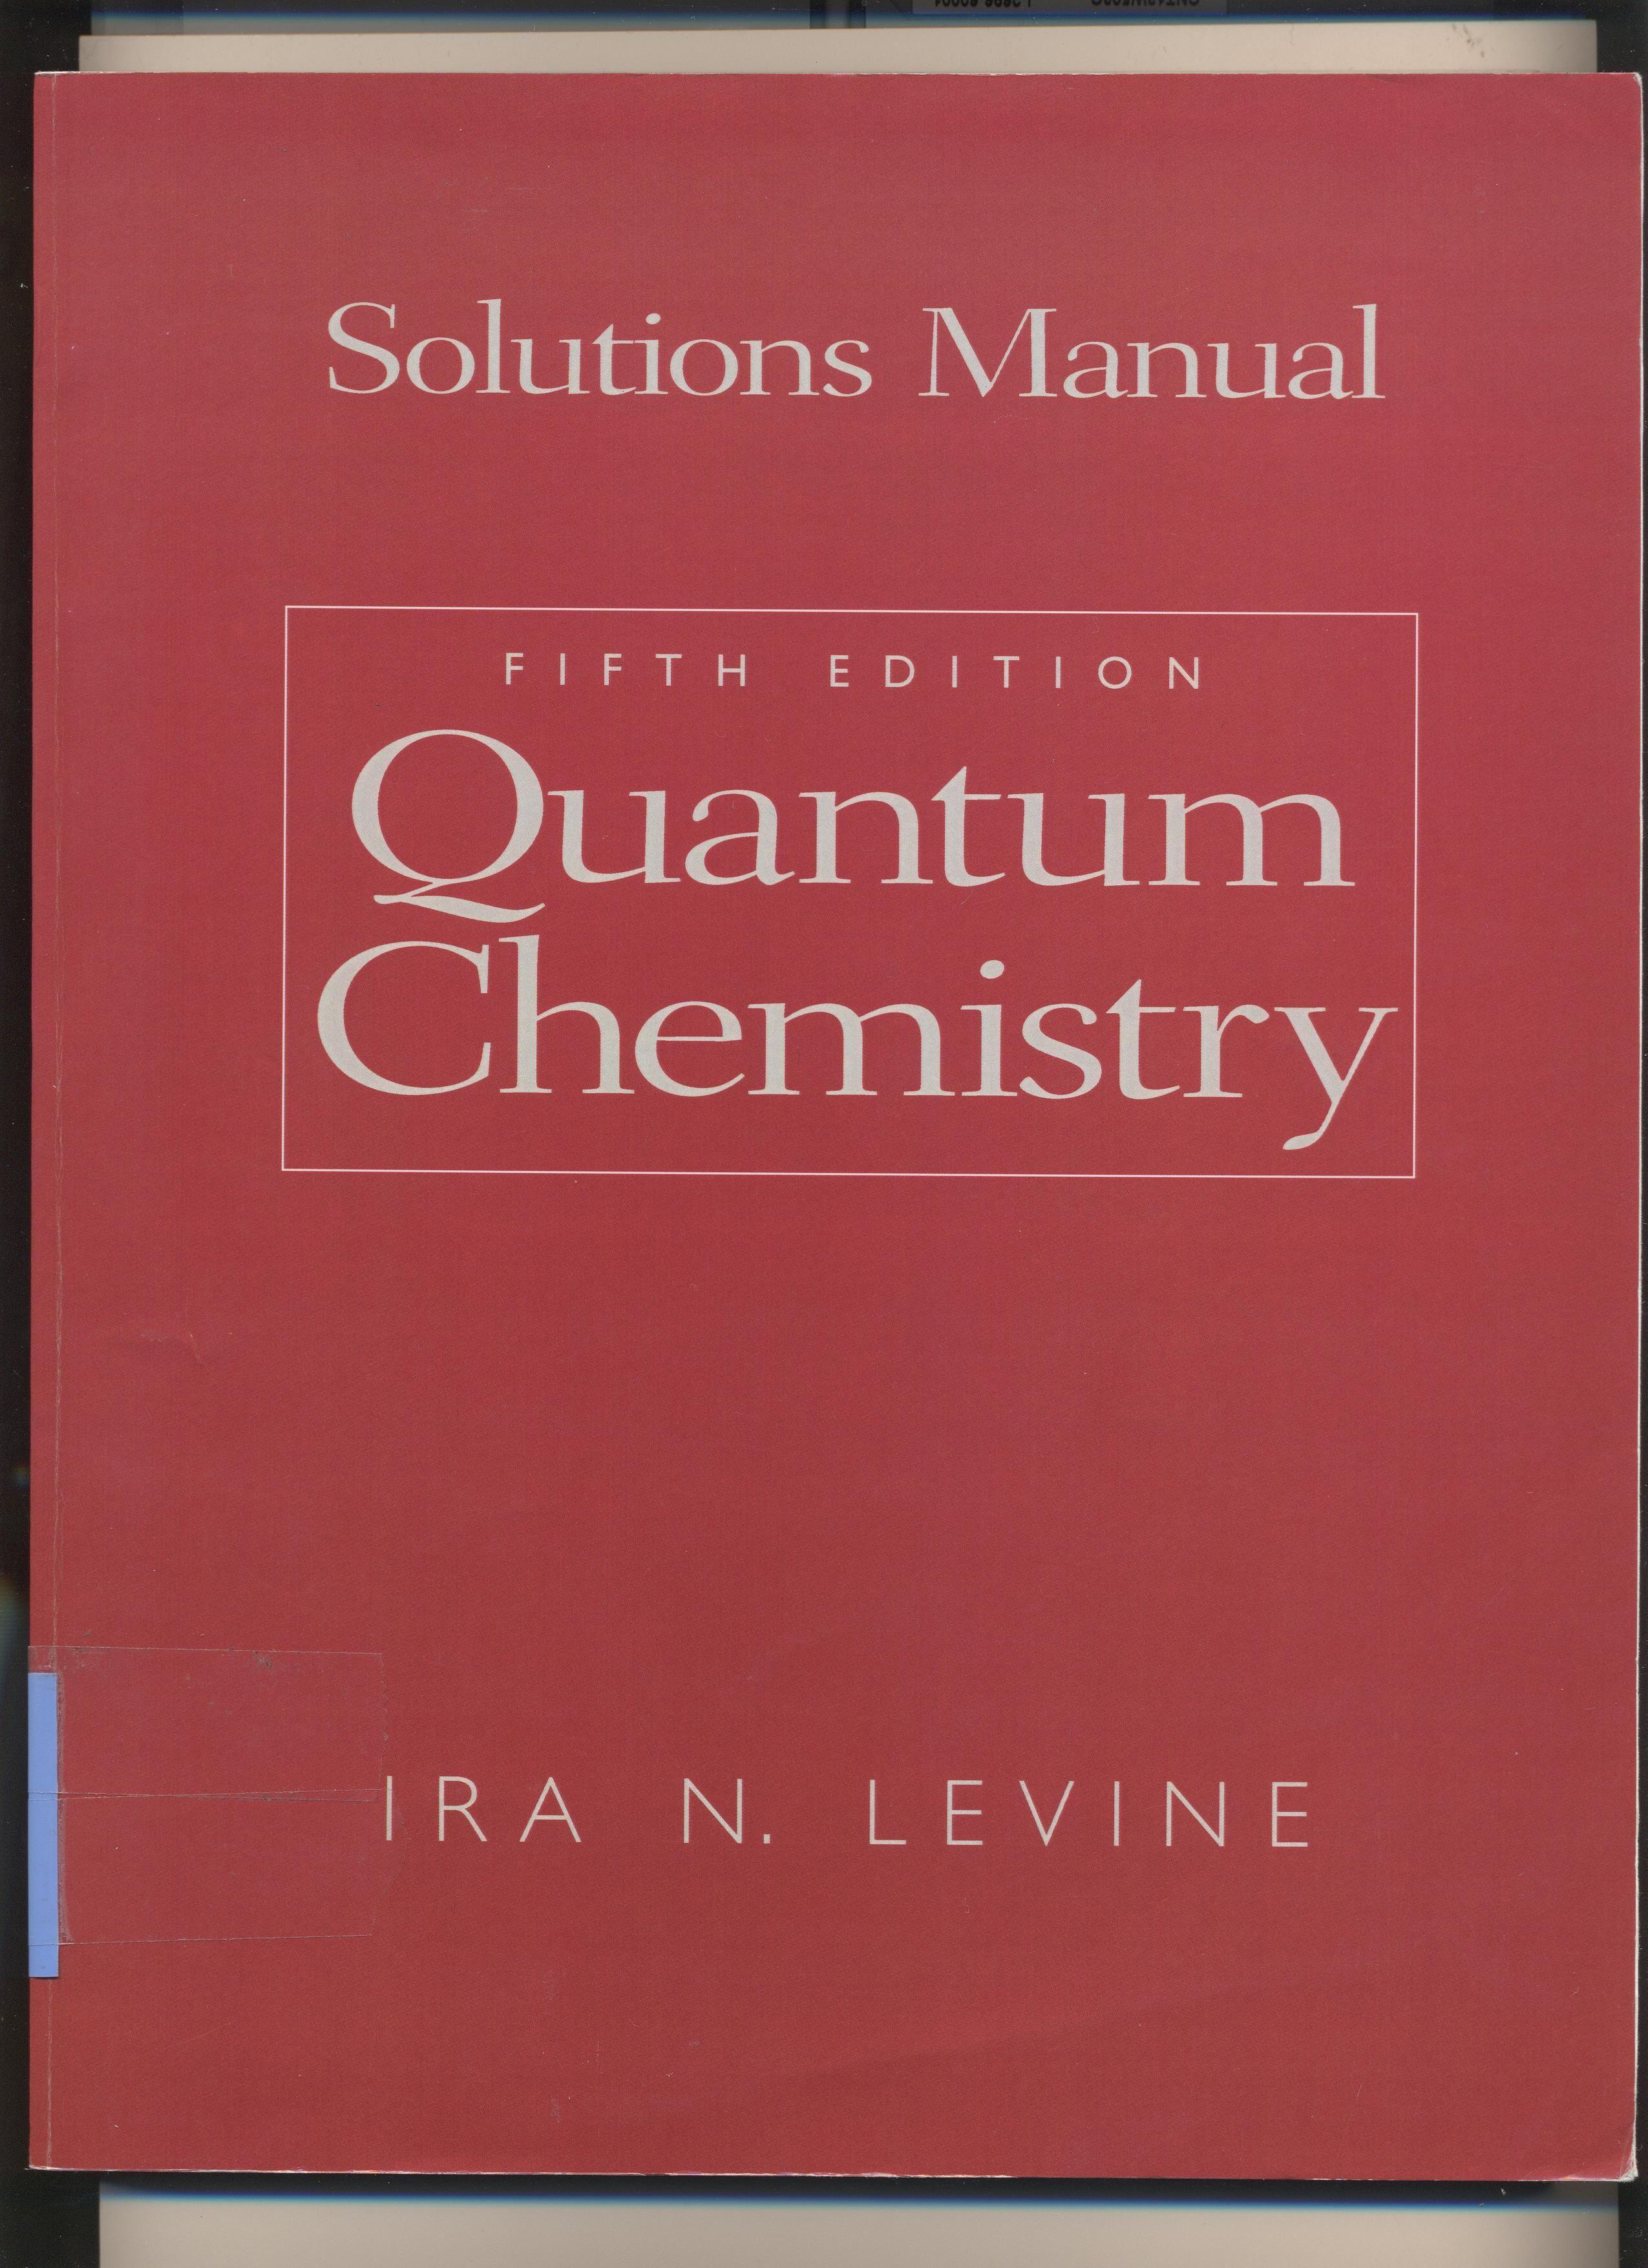 Quantum chemistry : solutions manual